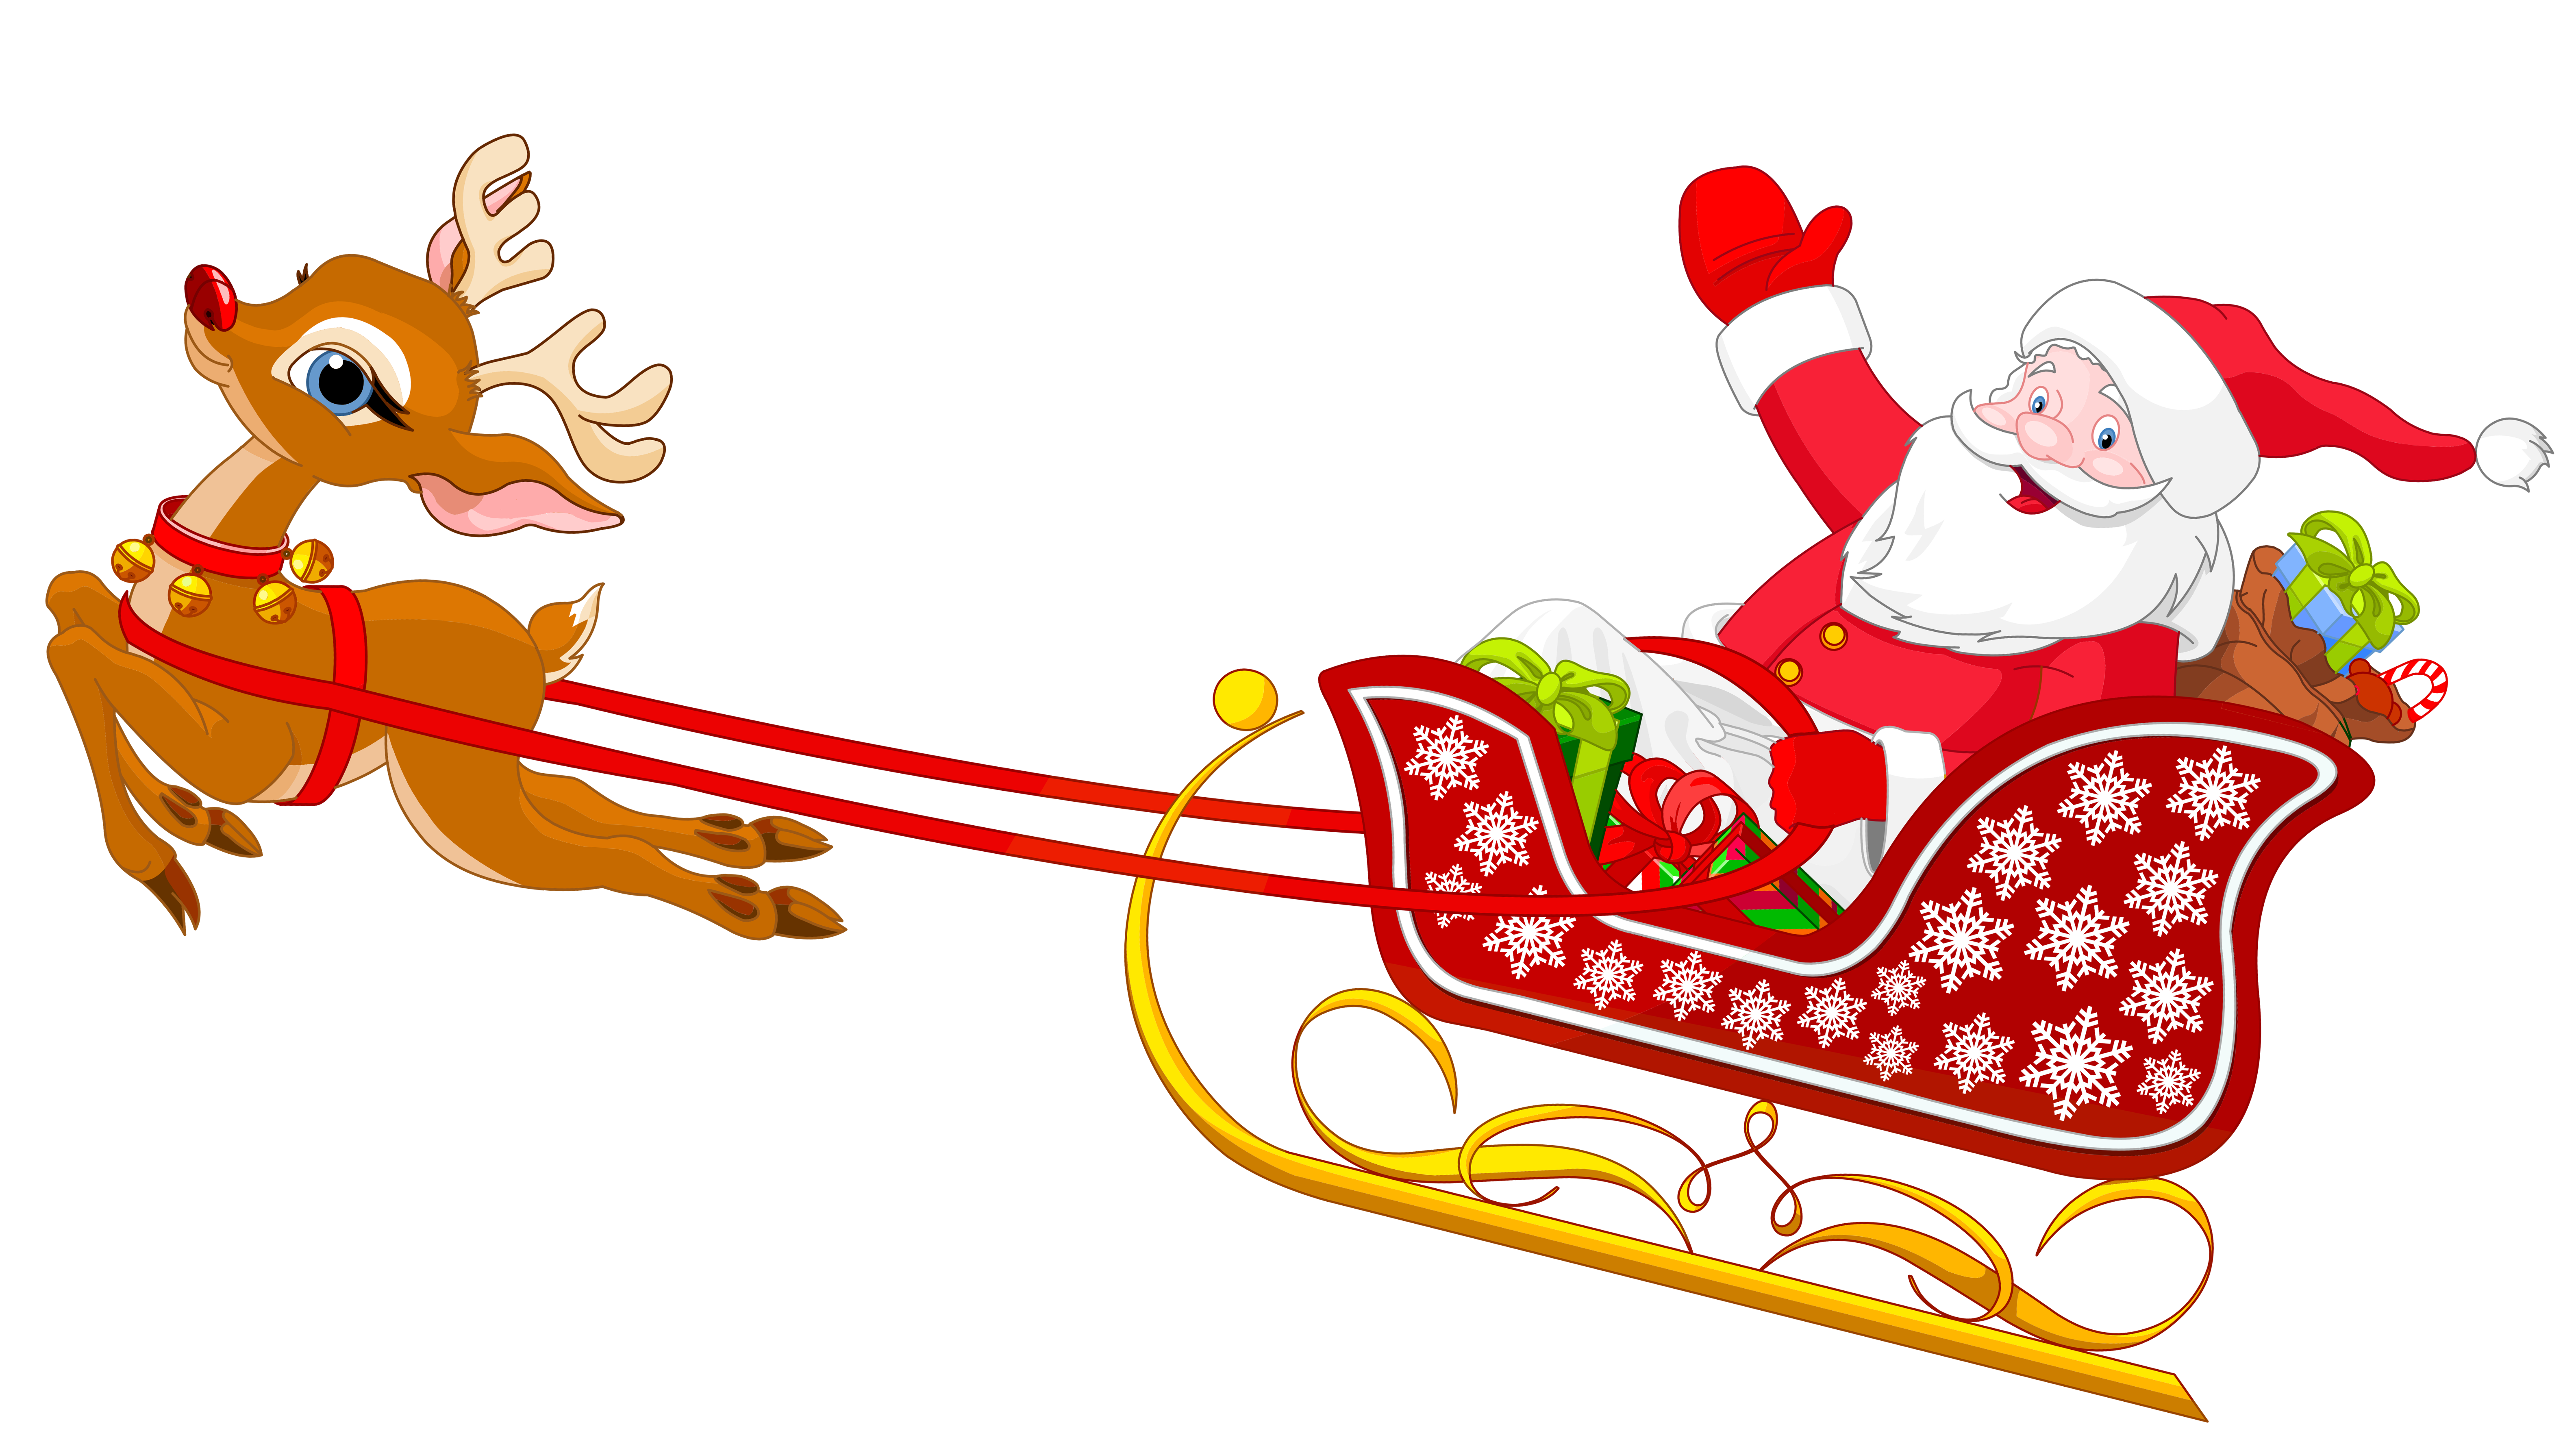 Clipart Santa And Reindeer .-Clipart Santa And Reindeer .-6